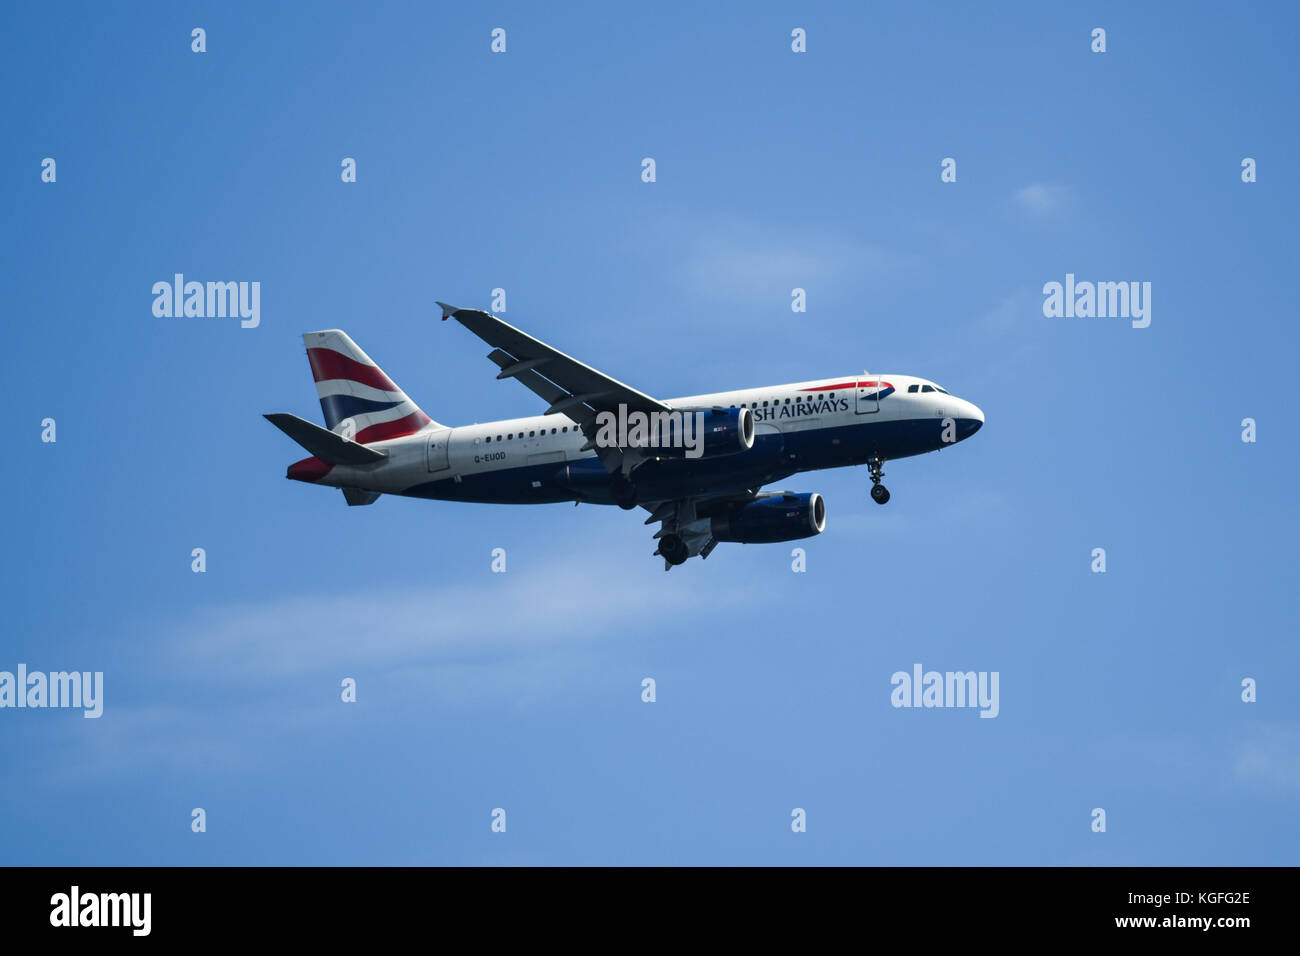 Bergen, Norway, 24 July 2017: British airways plane flying against the blue sky in Norway. - Stock Image